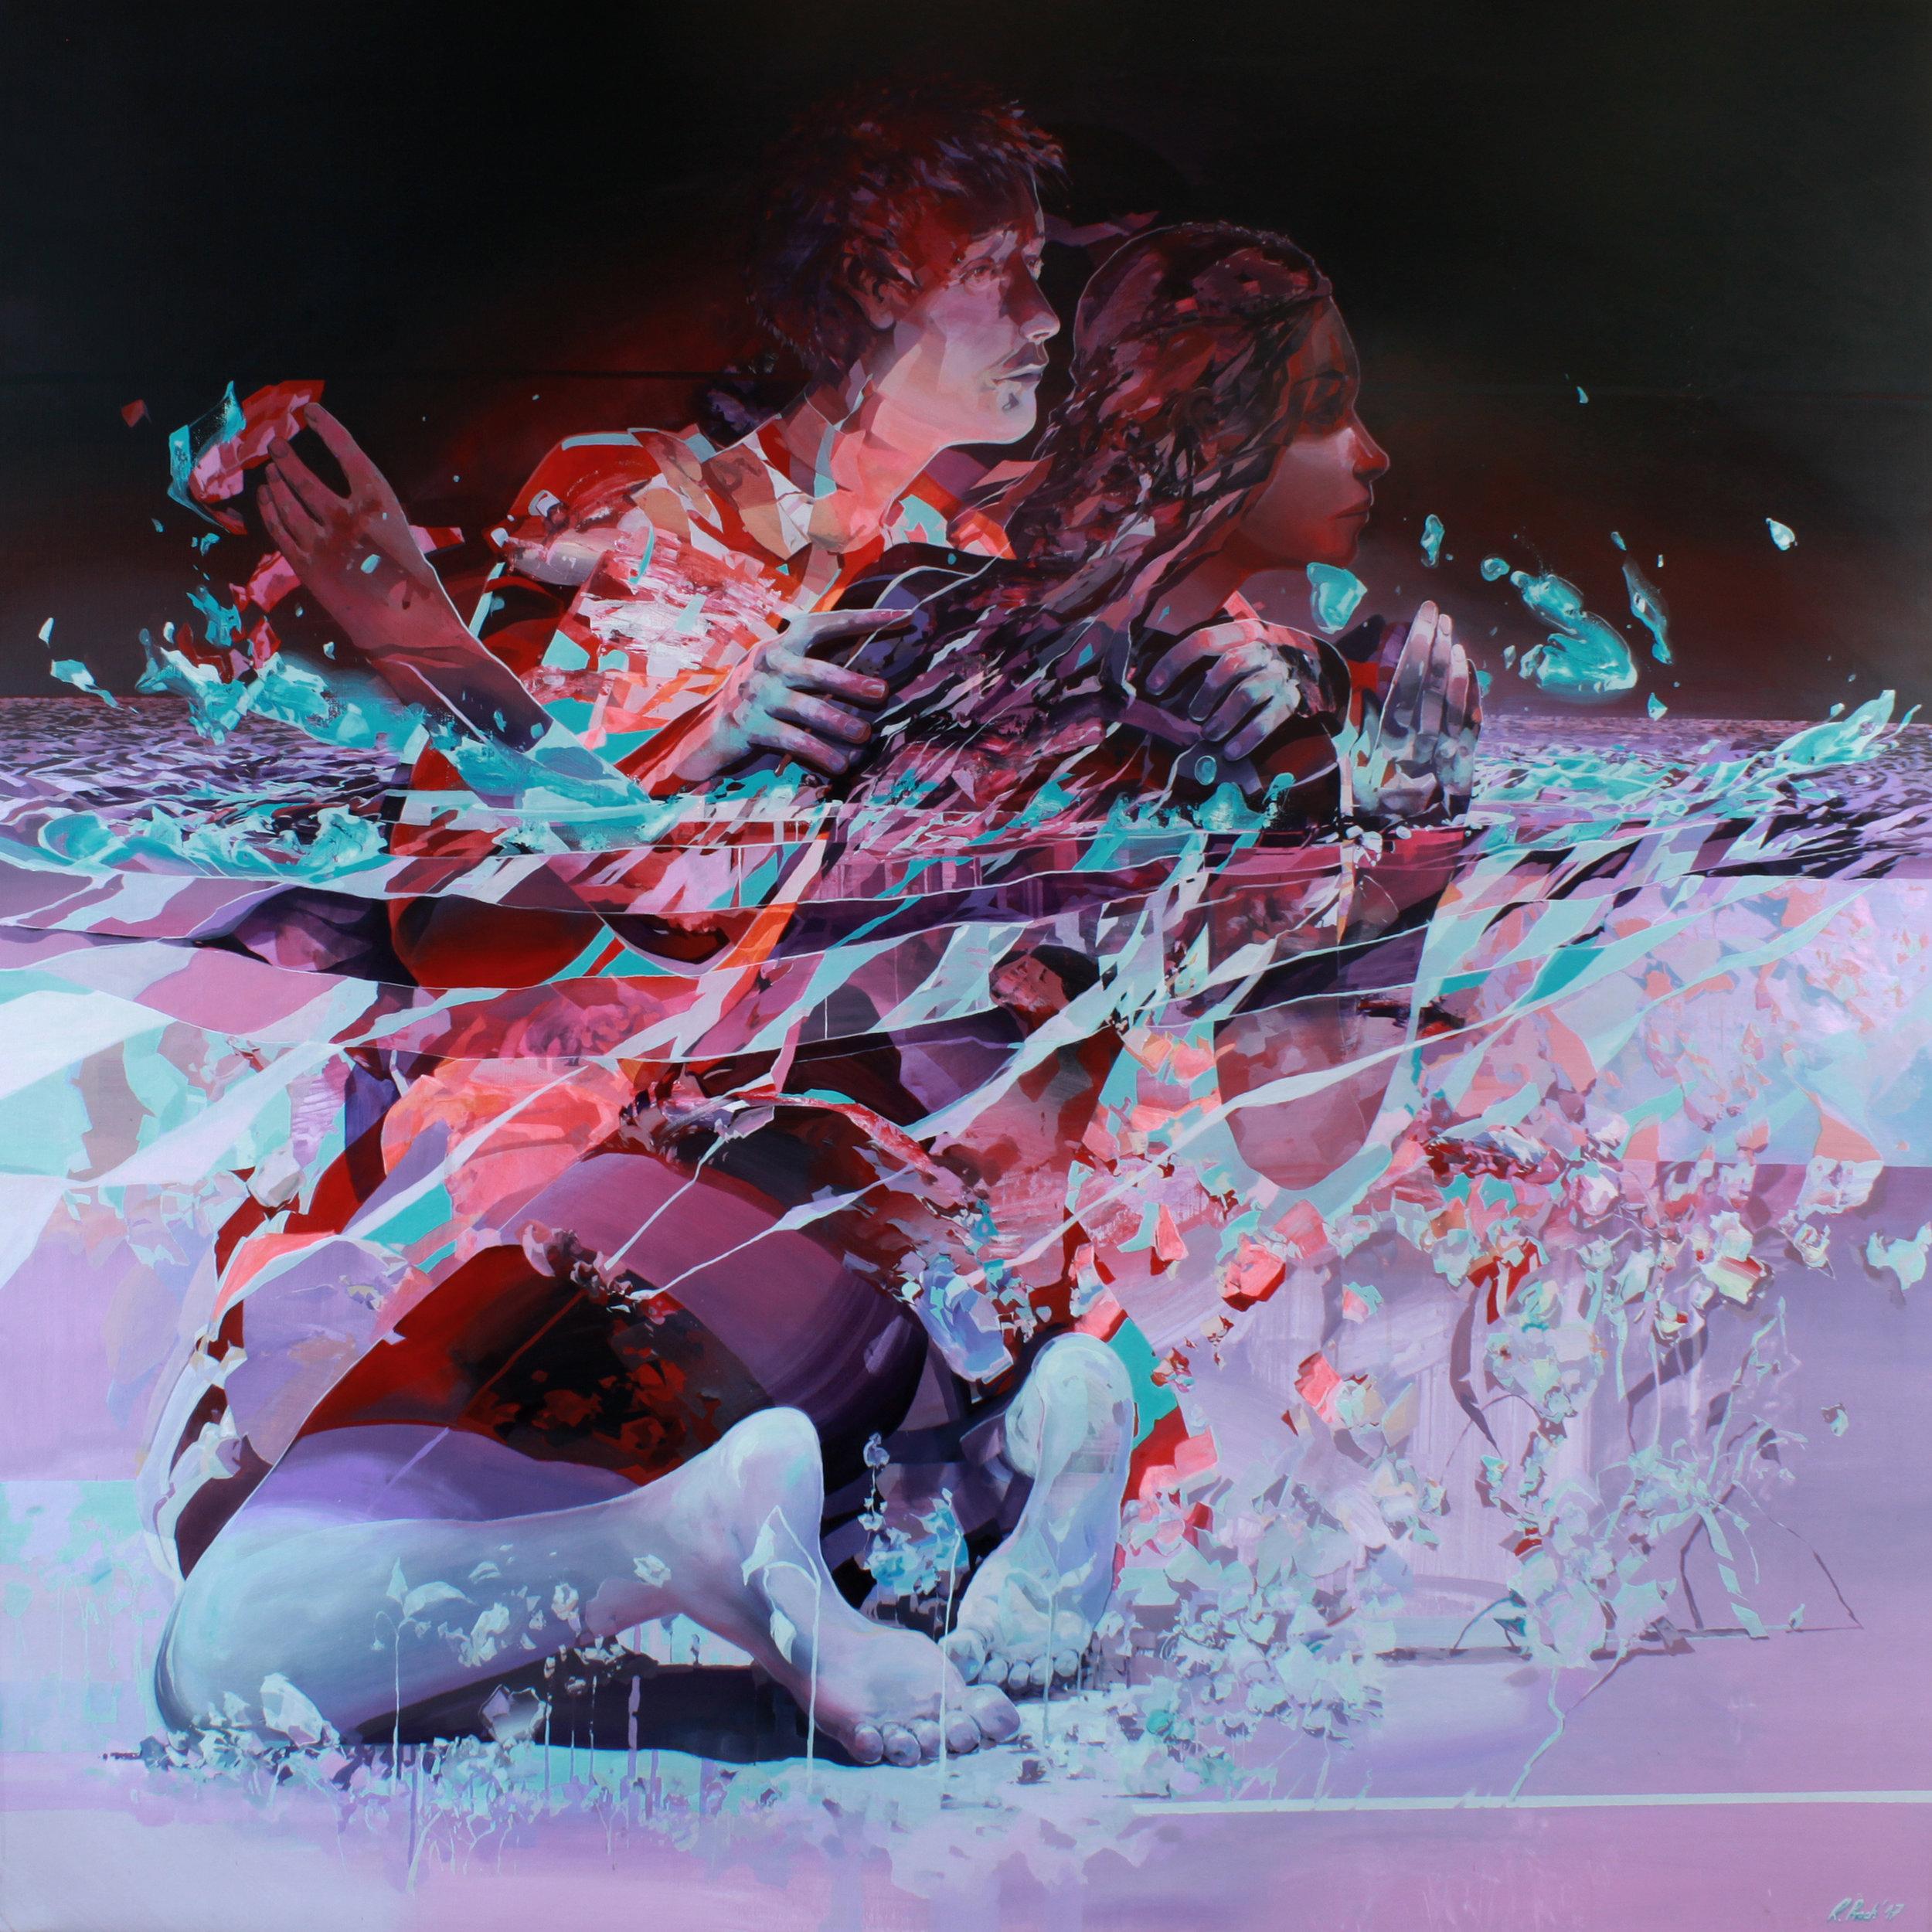 'Things you didn't tell me' 180x180cm acrylic on canvas 2017.jpg